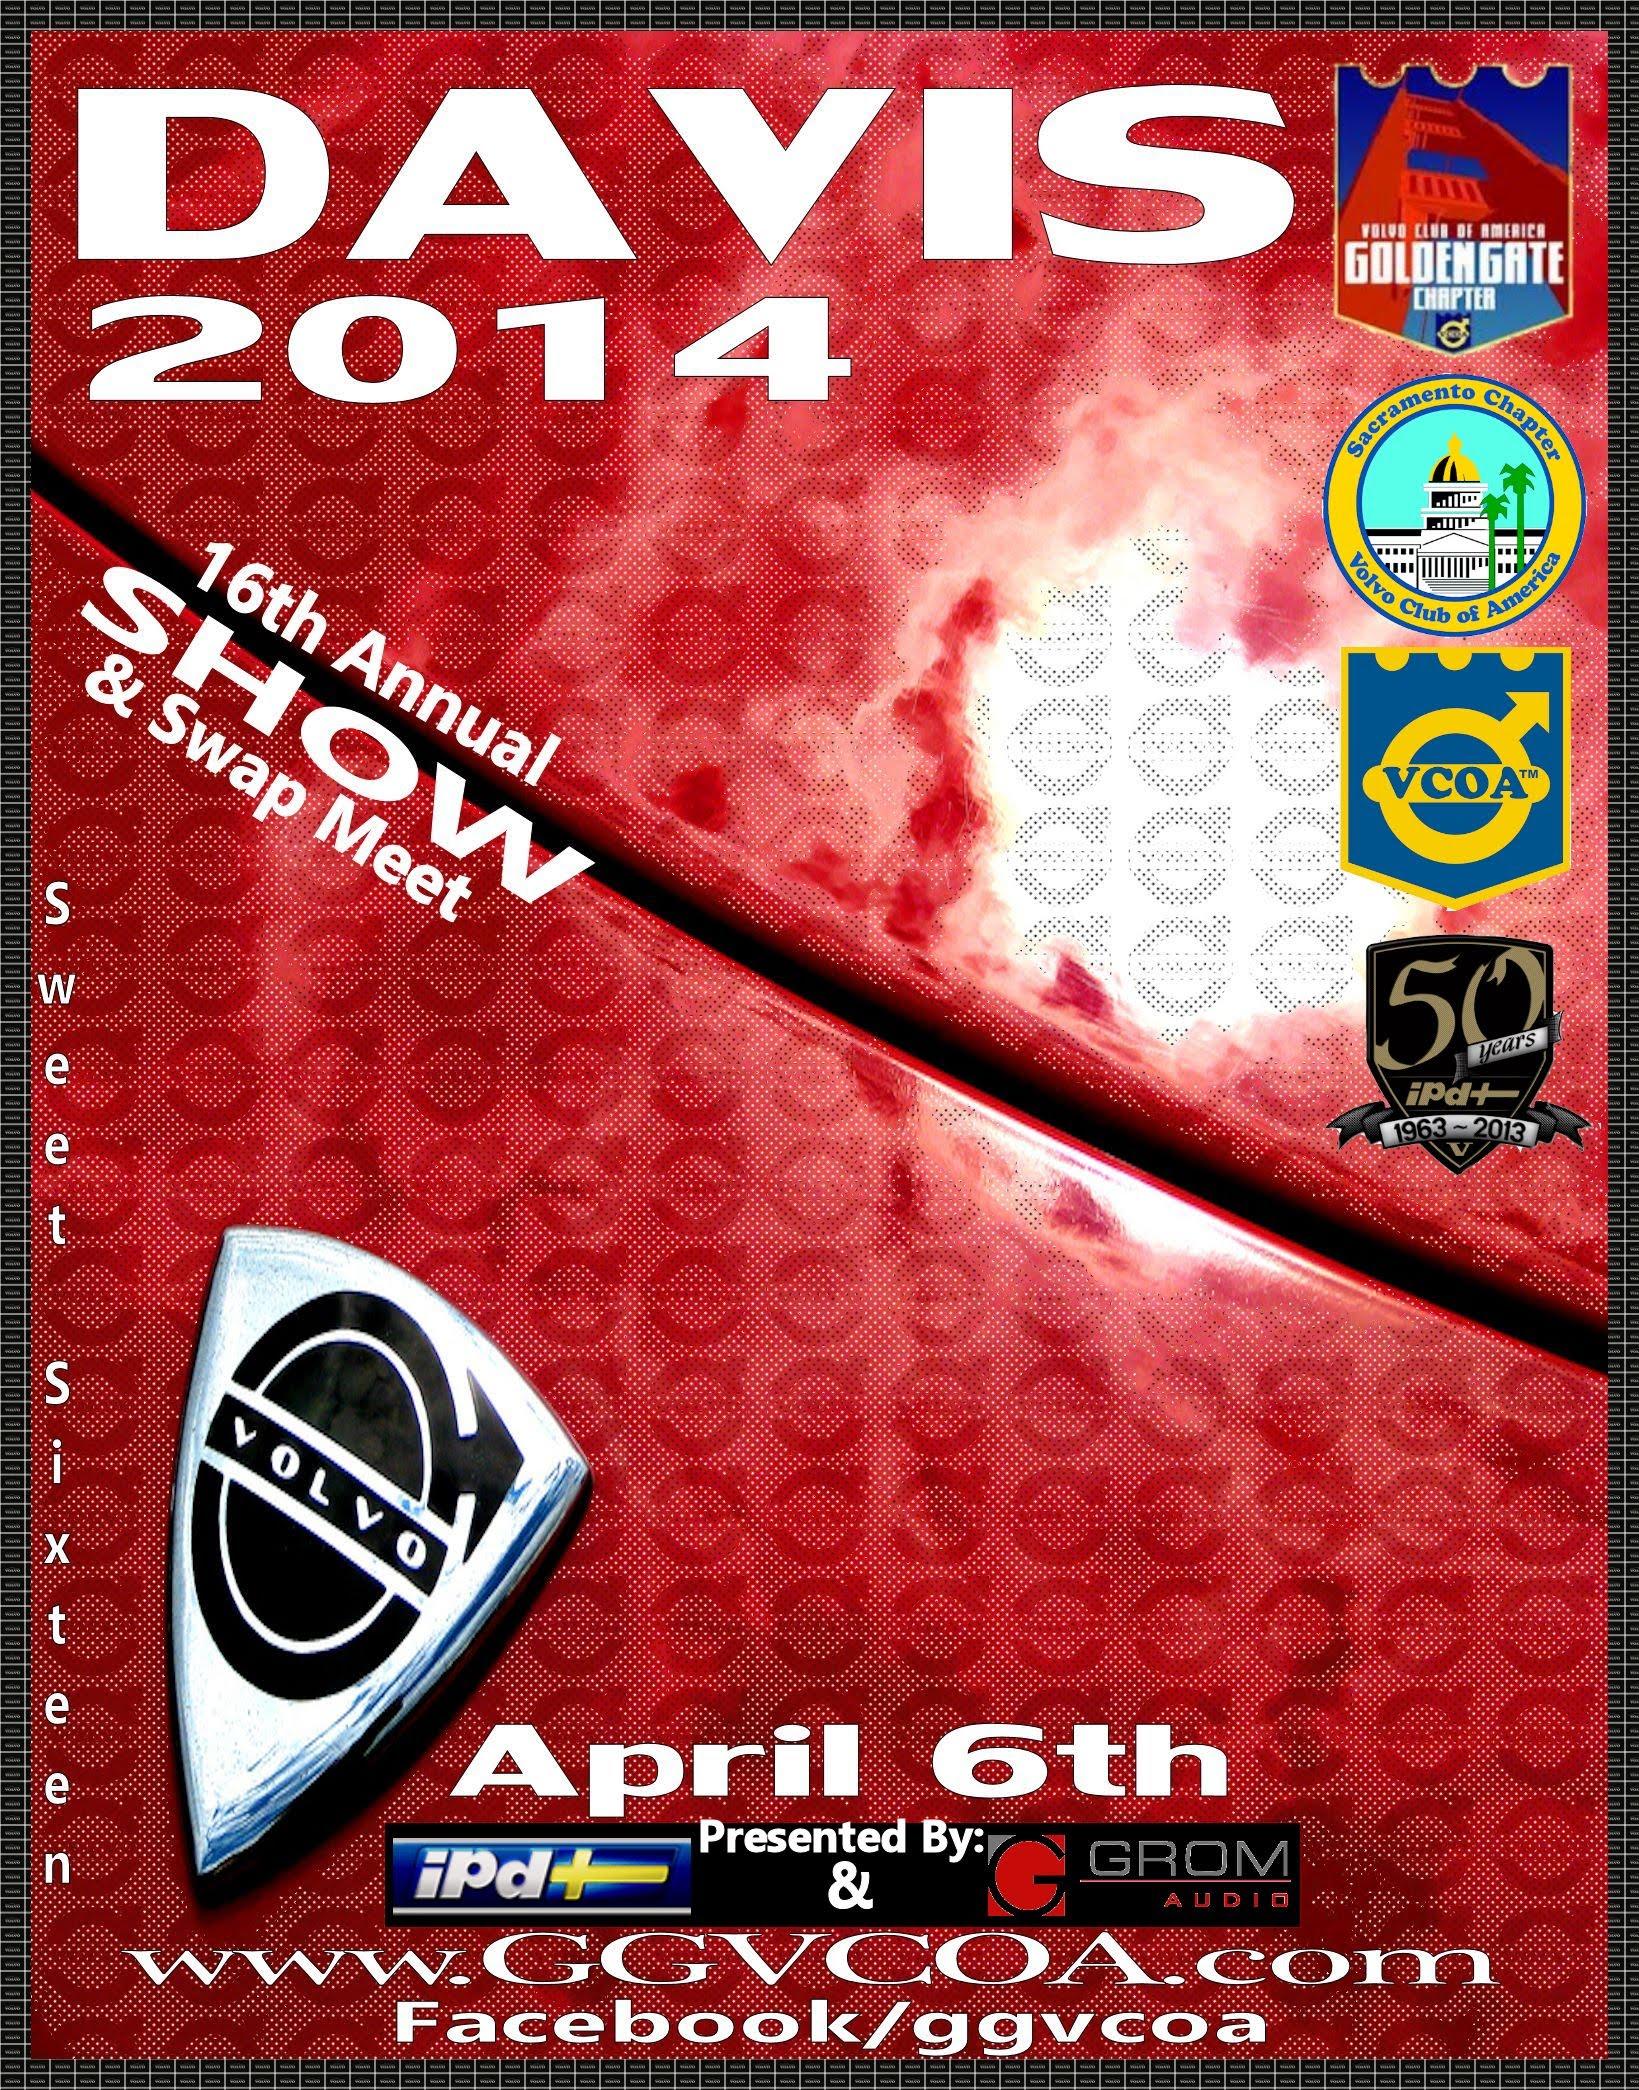 April 5-6, 2014: 16th Annual Davis Meet Weekend (w/ GGVCOA) Davis%202014%20Show%20Promo%20IPD-GROM